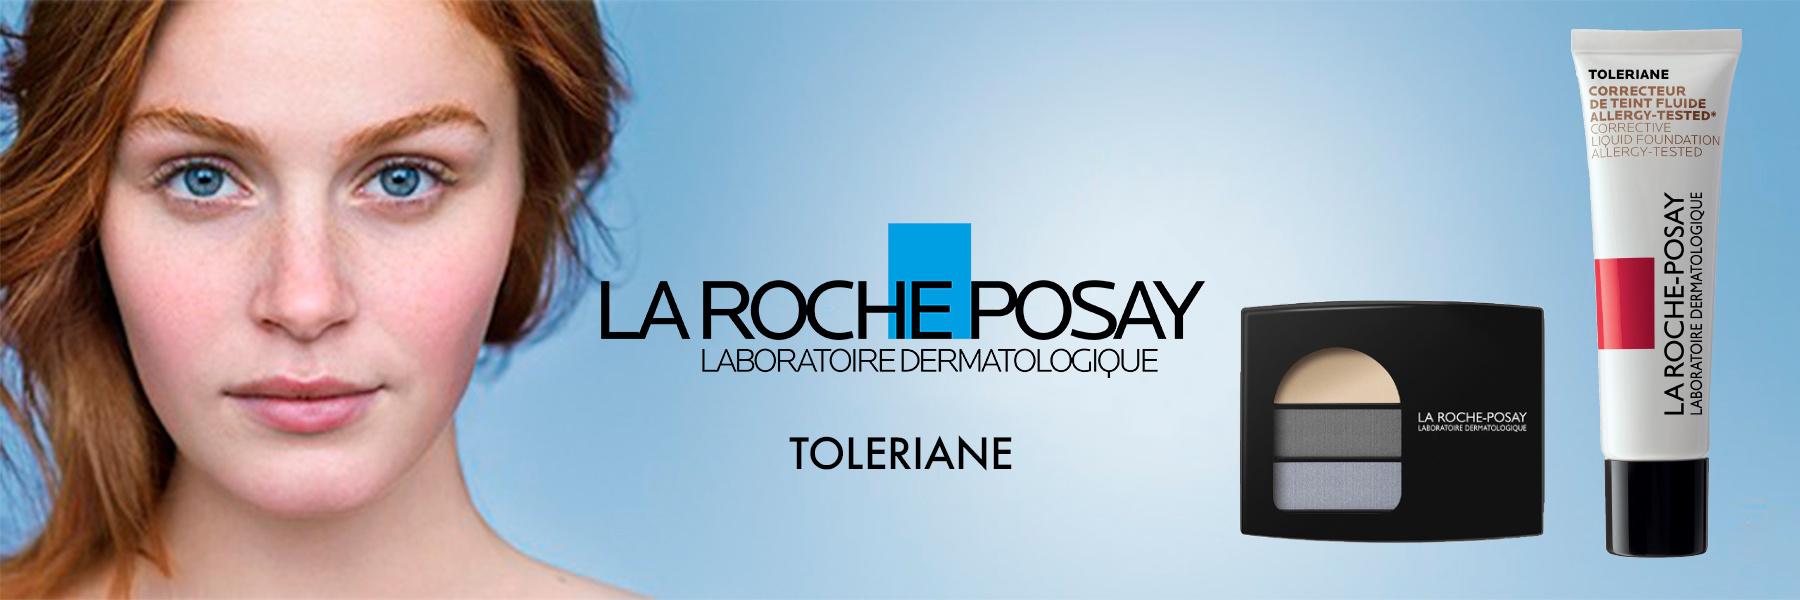 La Roche Posay Toleriane Teint